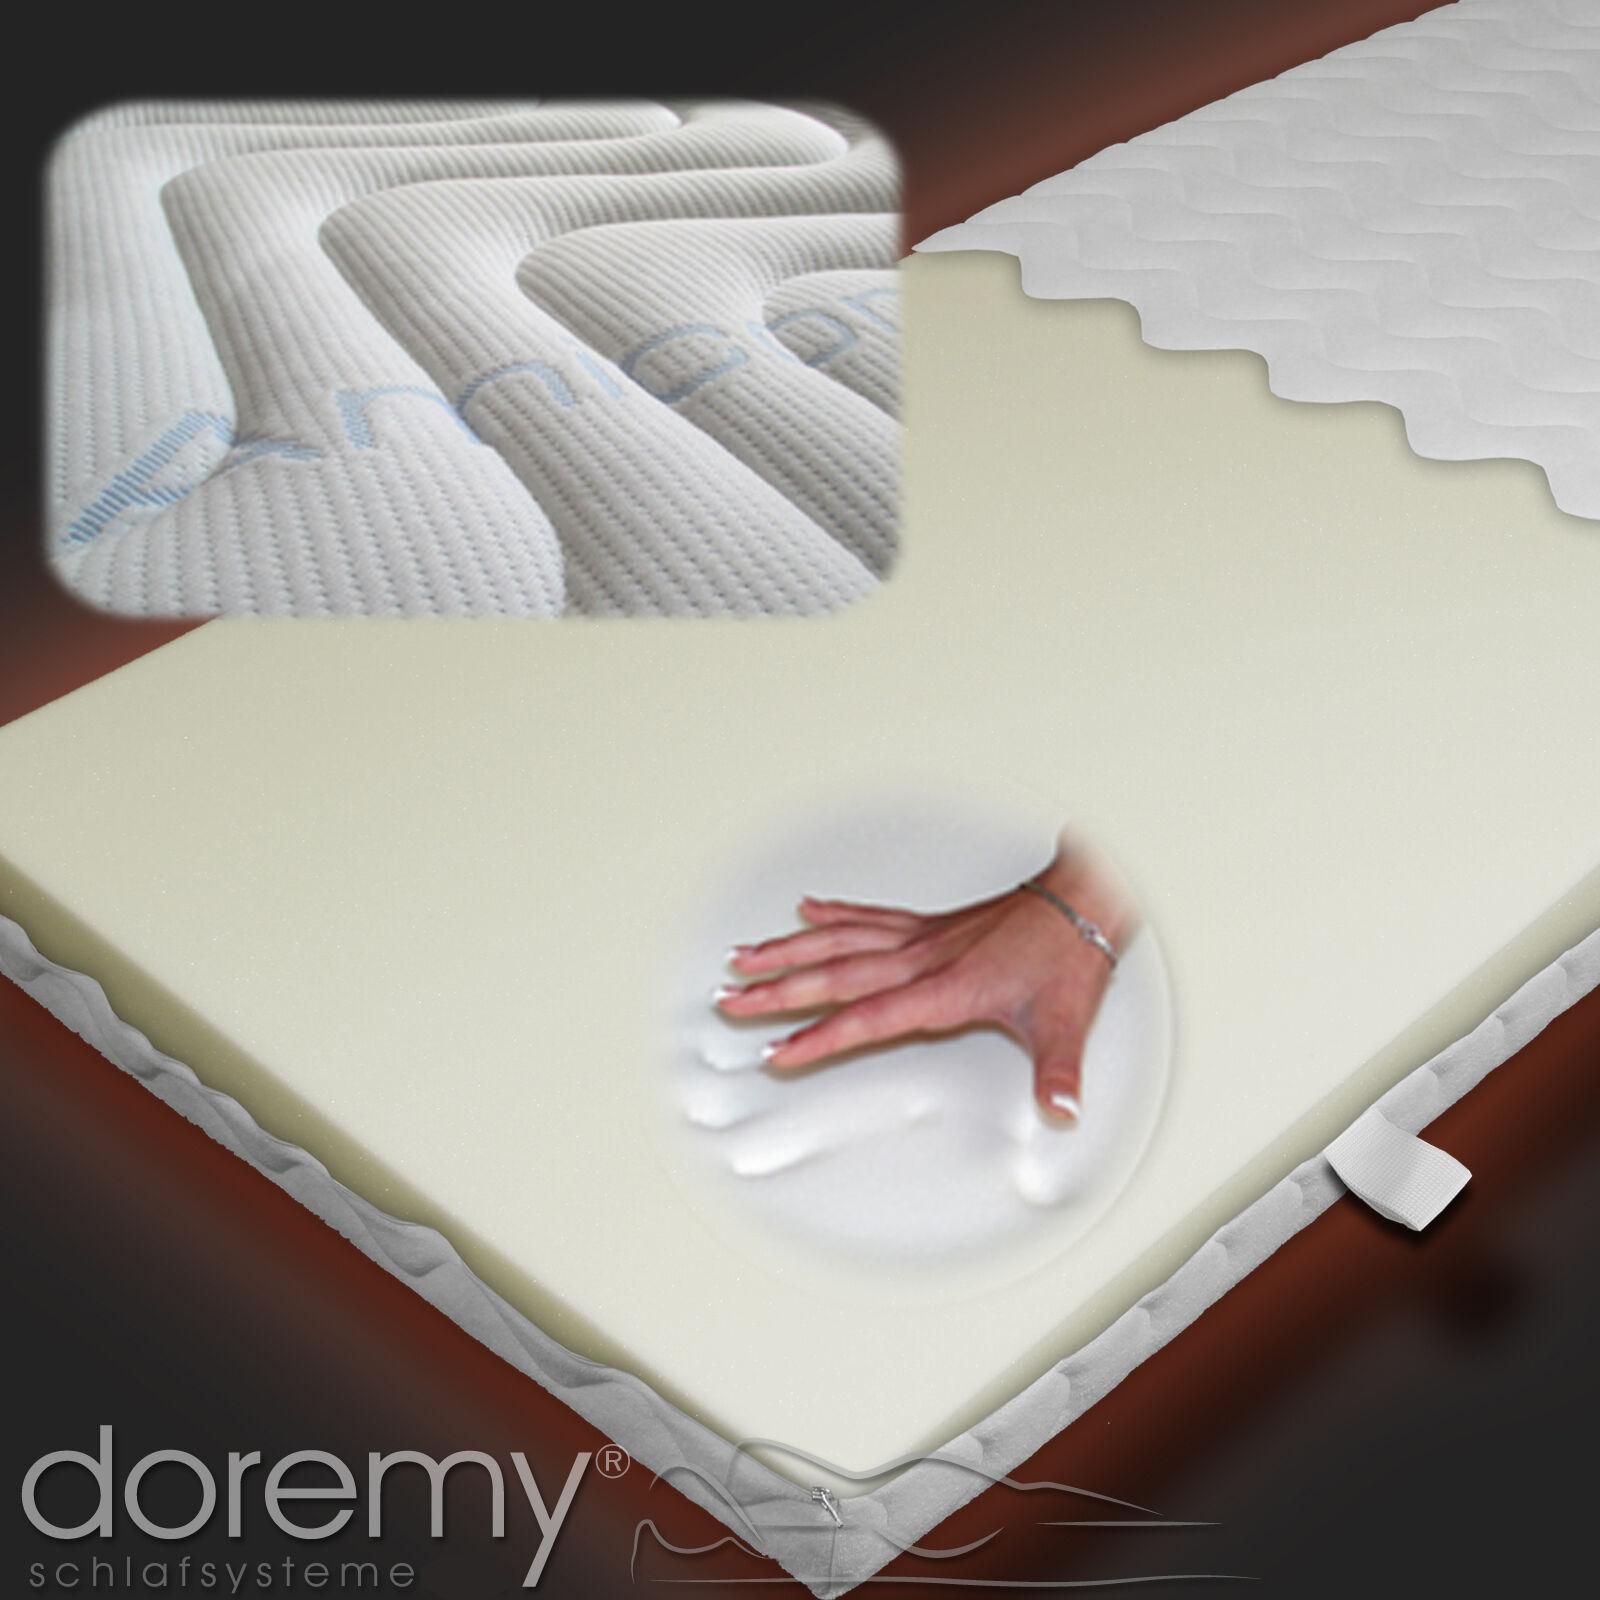 100% Visco Matratzenauflage Topper, memoryfoam Viscoauflage inkl. 1A-Top-Bezug